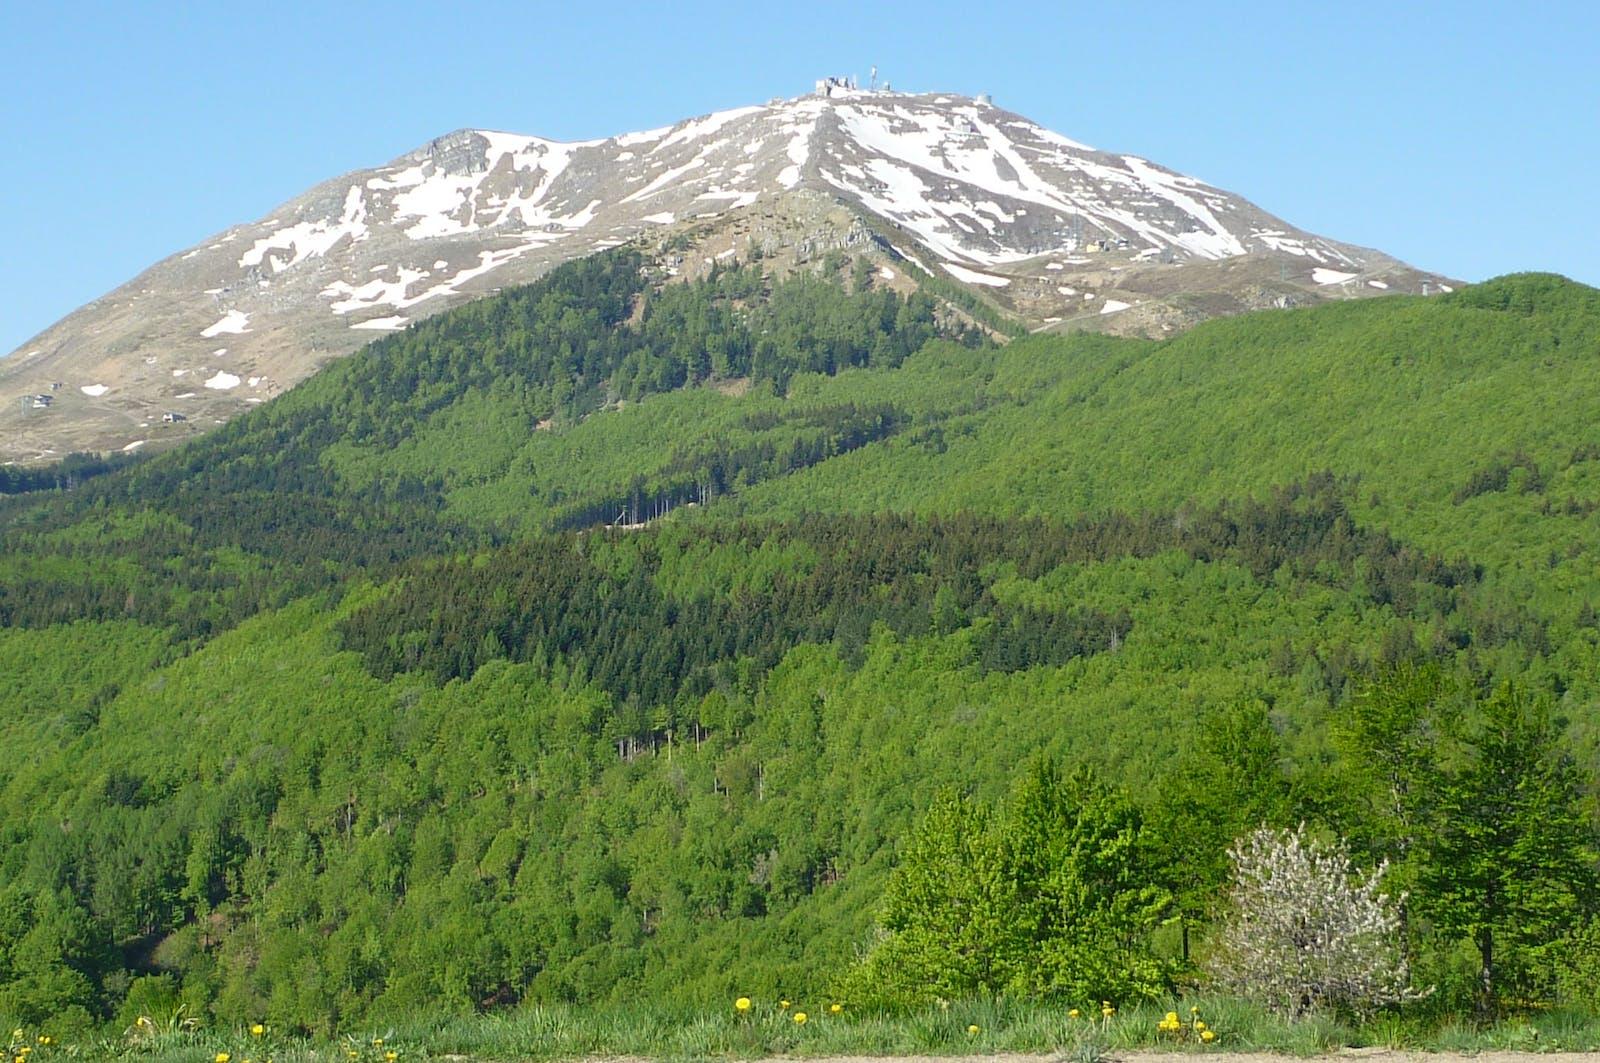 Appenine Deciduous Montane Forests